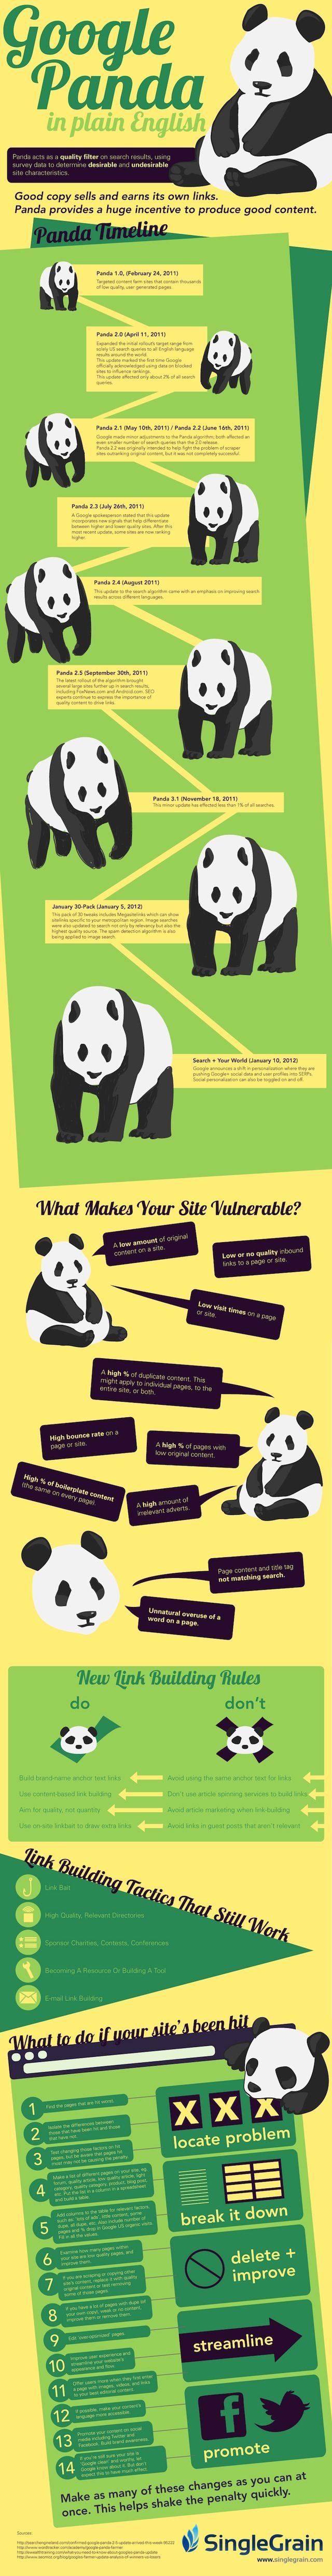 Infographie sur Google Panda